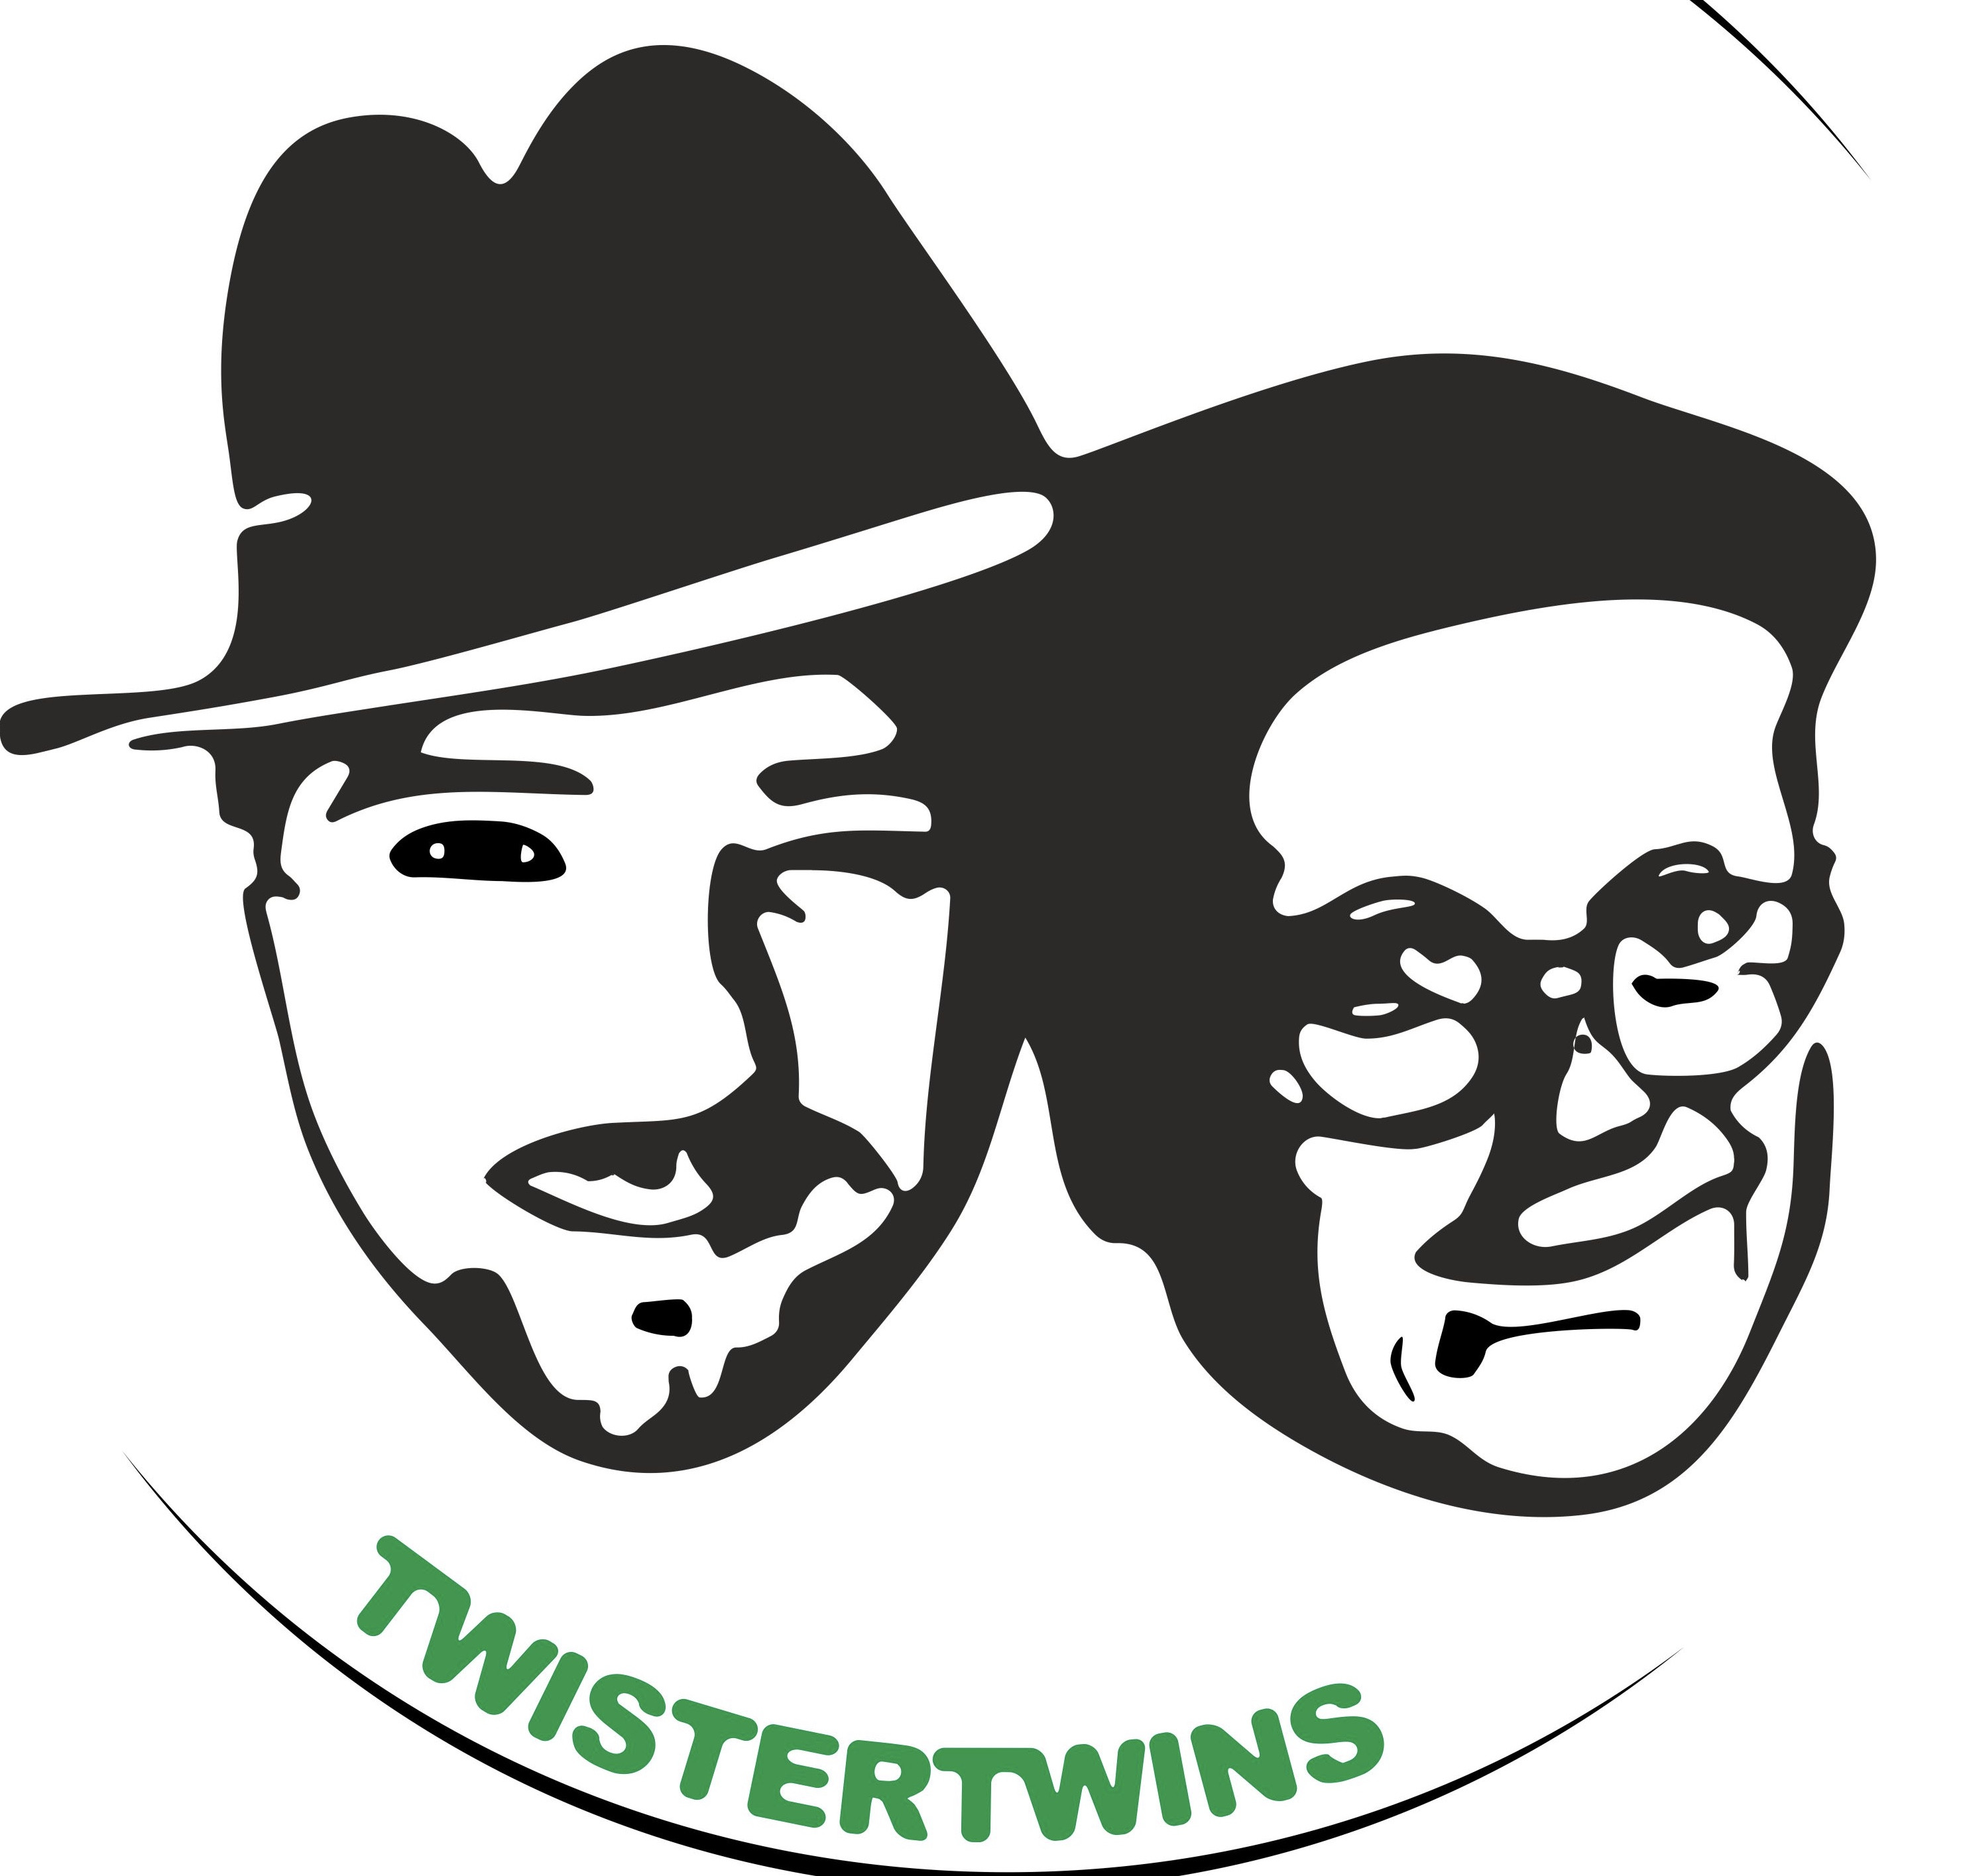 Twistertwins